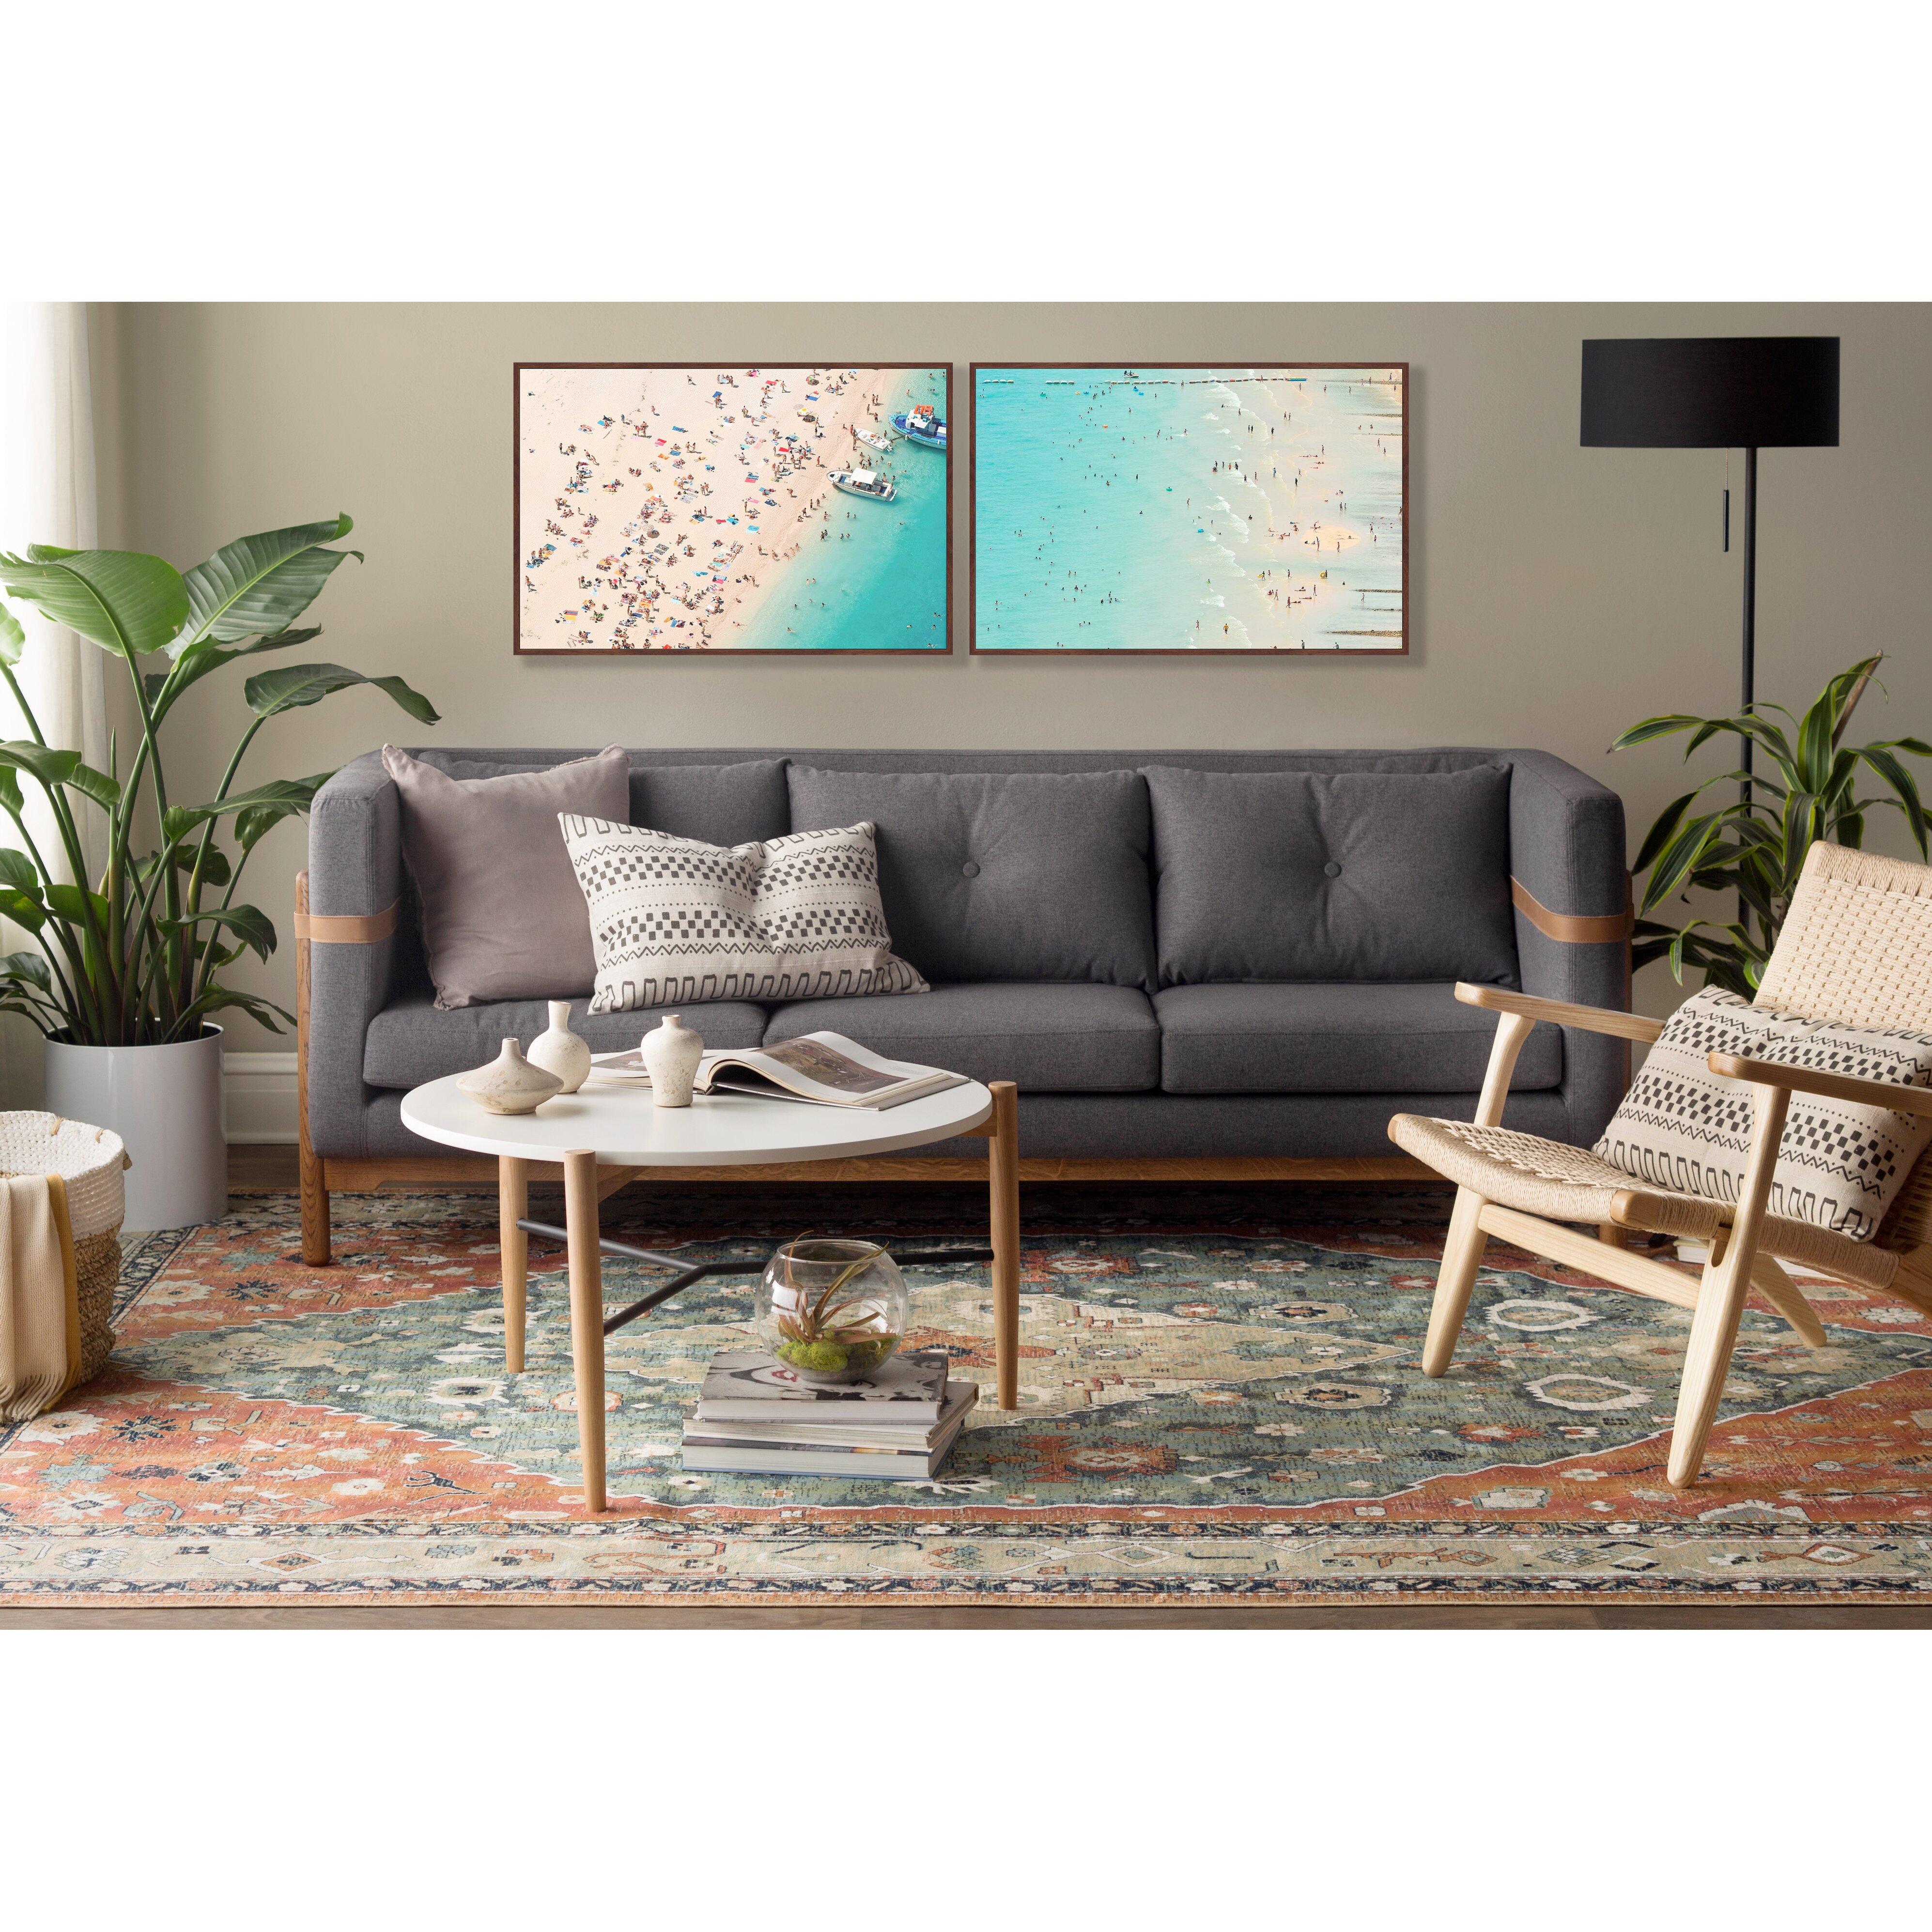 Abacasa Sonoma Aqua Celadon Rust Tan Area Rug Amp Reviews